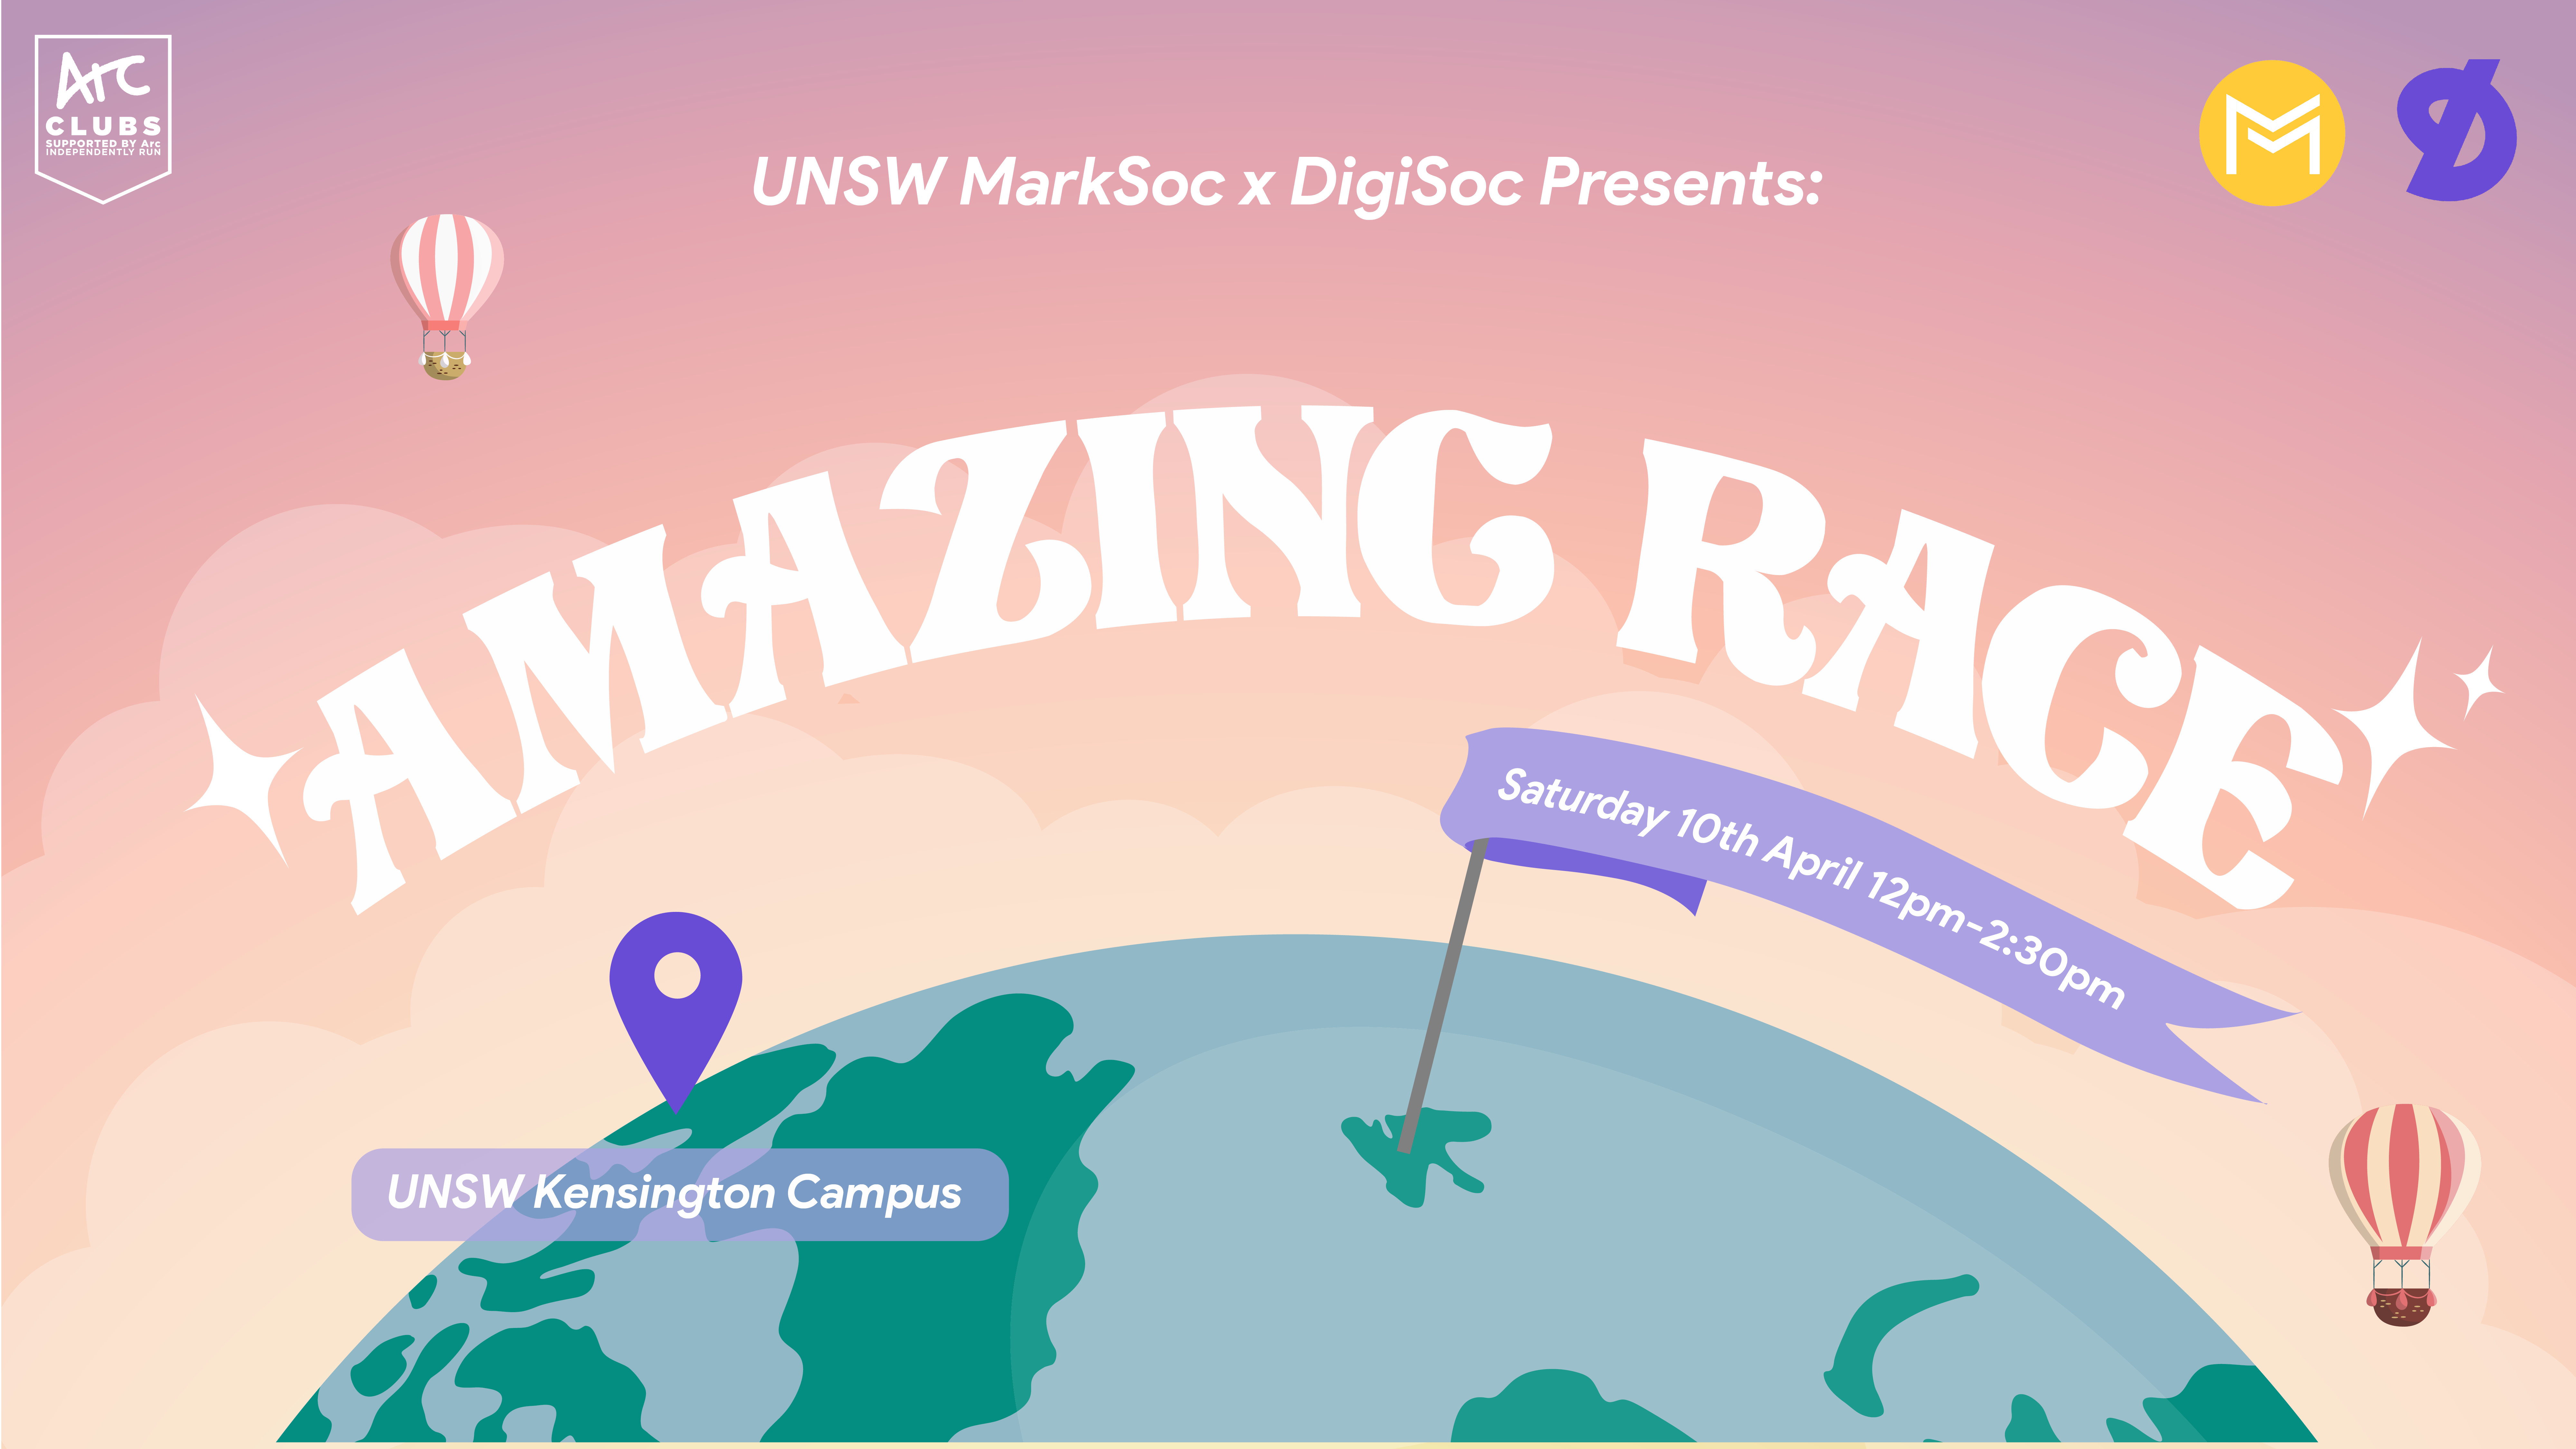 DigiSoc x MarkSoc Presents: Amazing Race